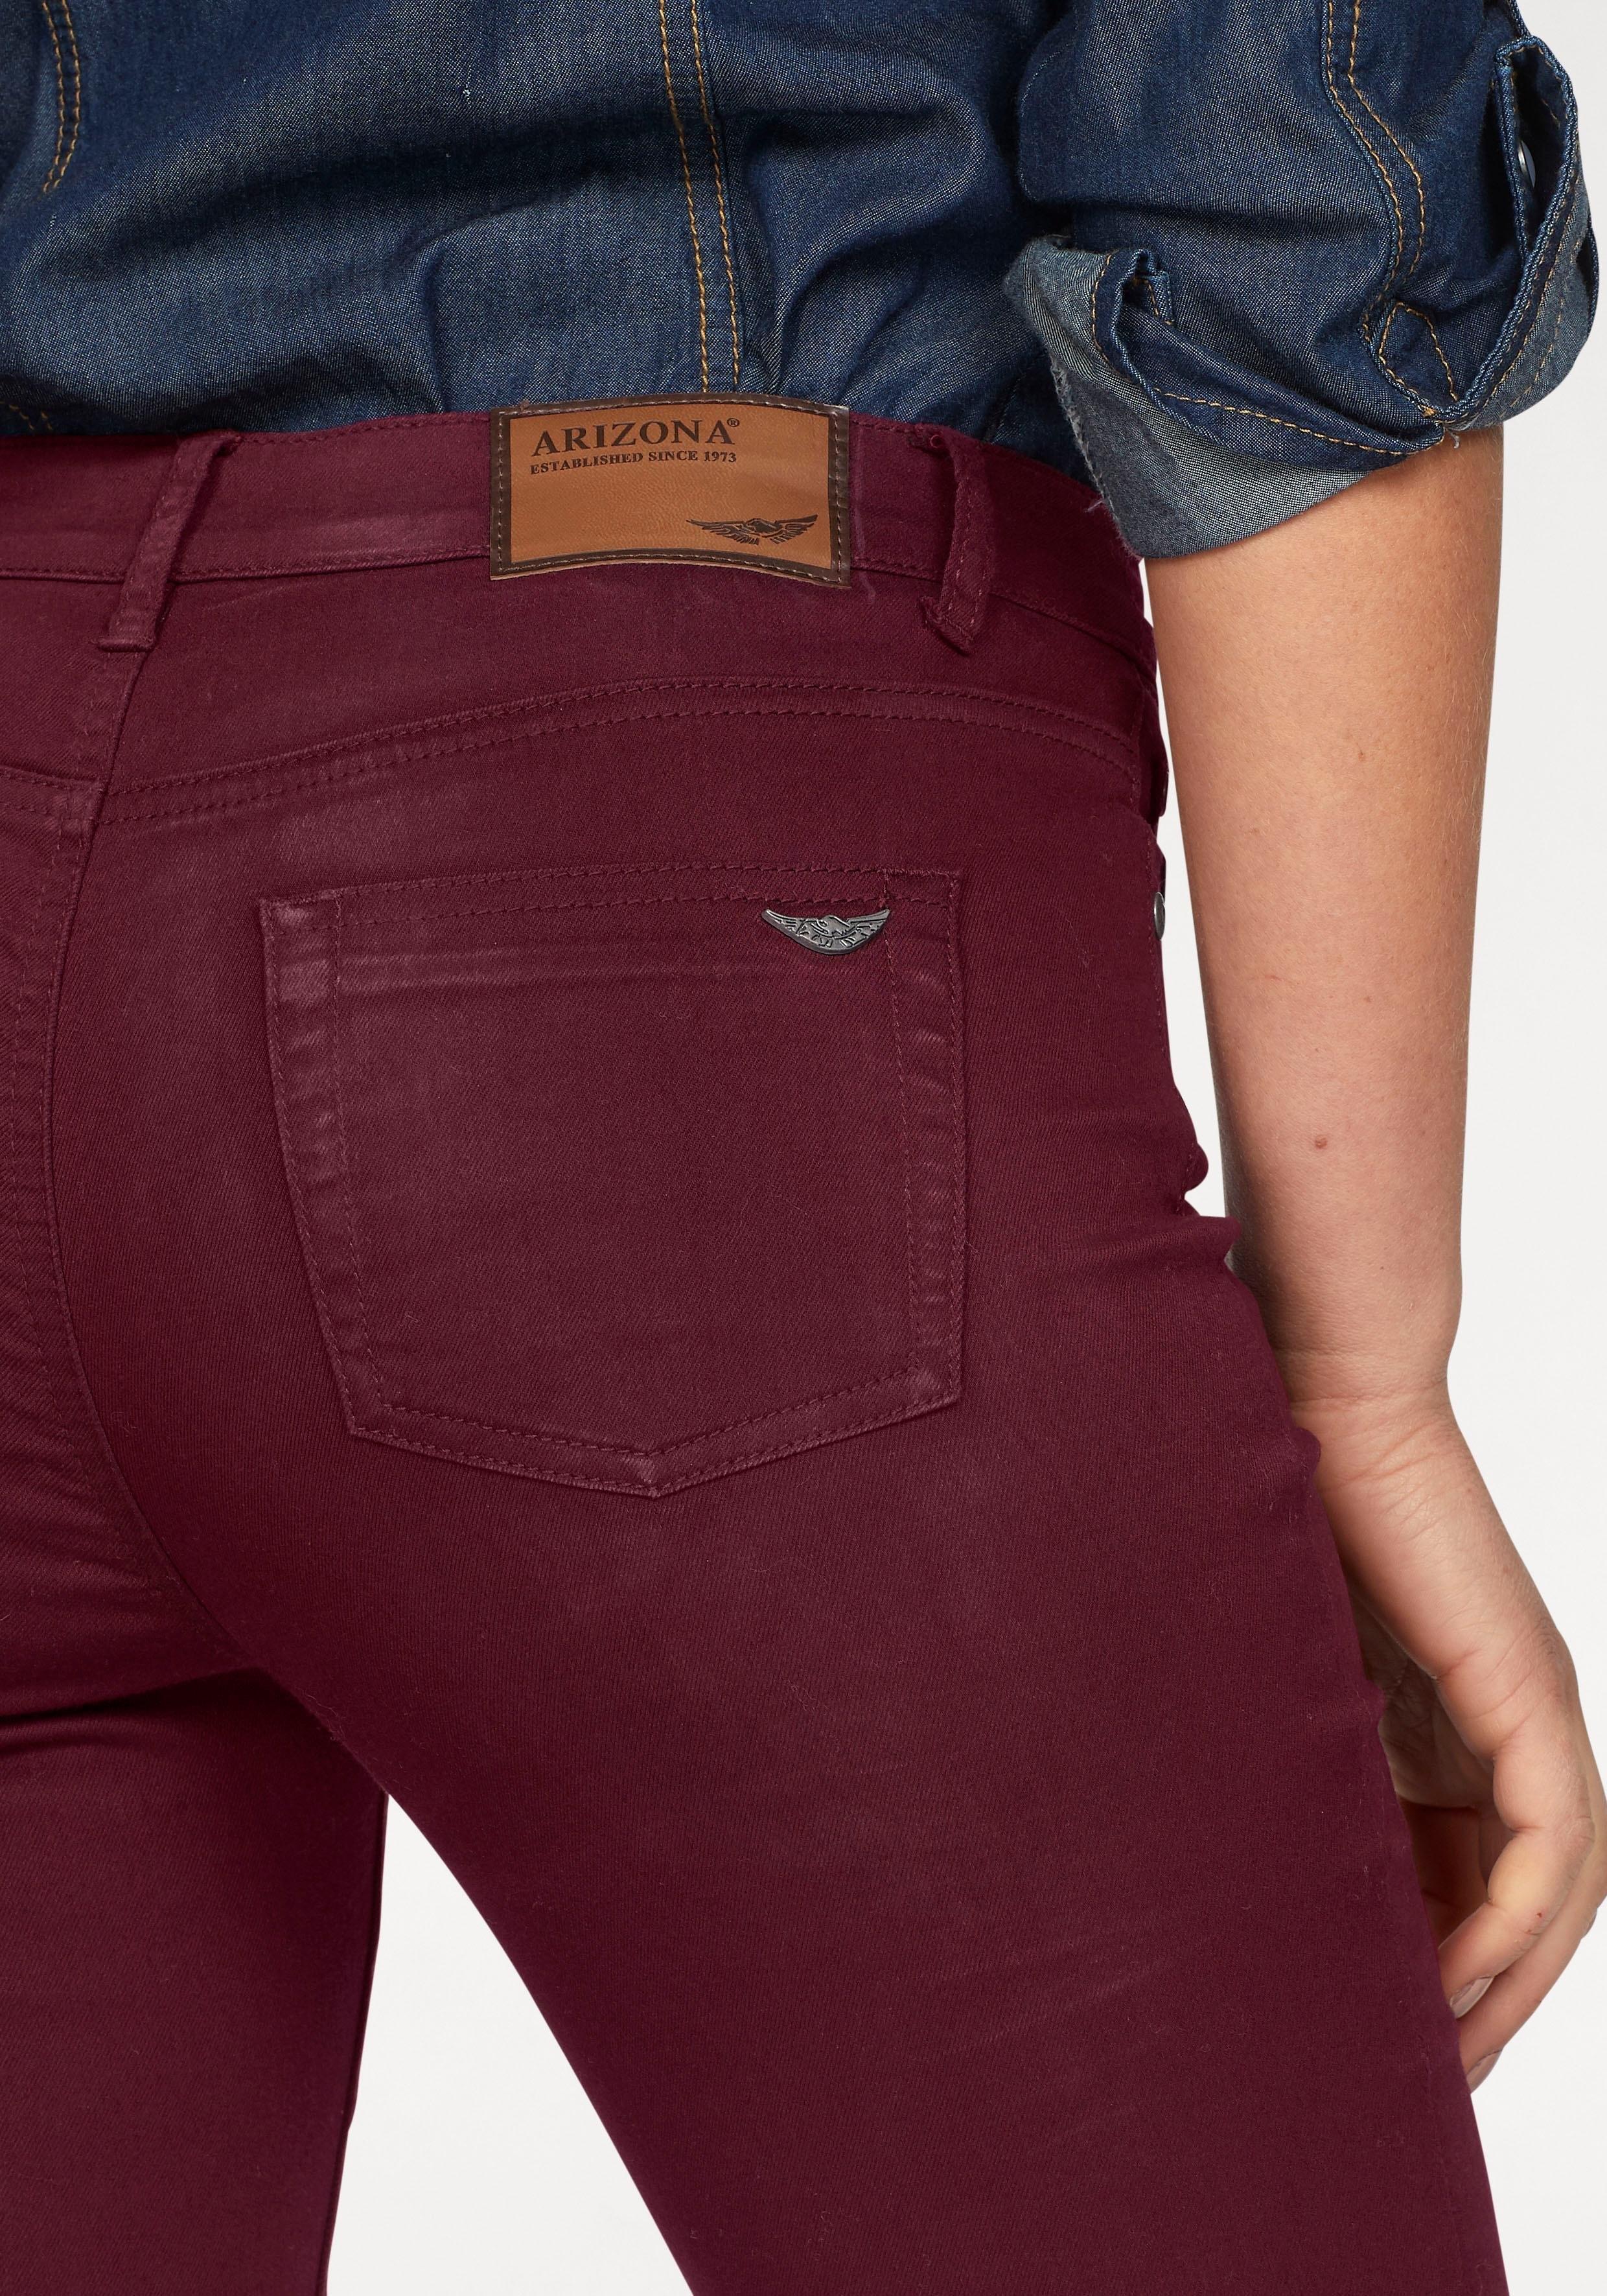 Bestellen High Nu Online jeans Arizona Waist KF1Jlc